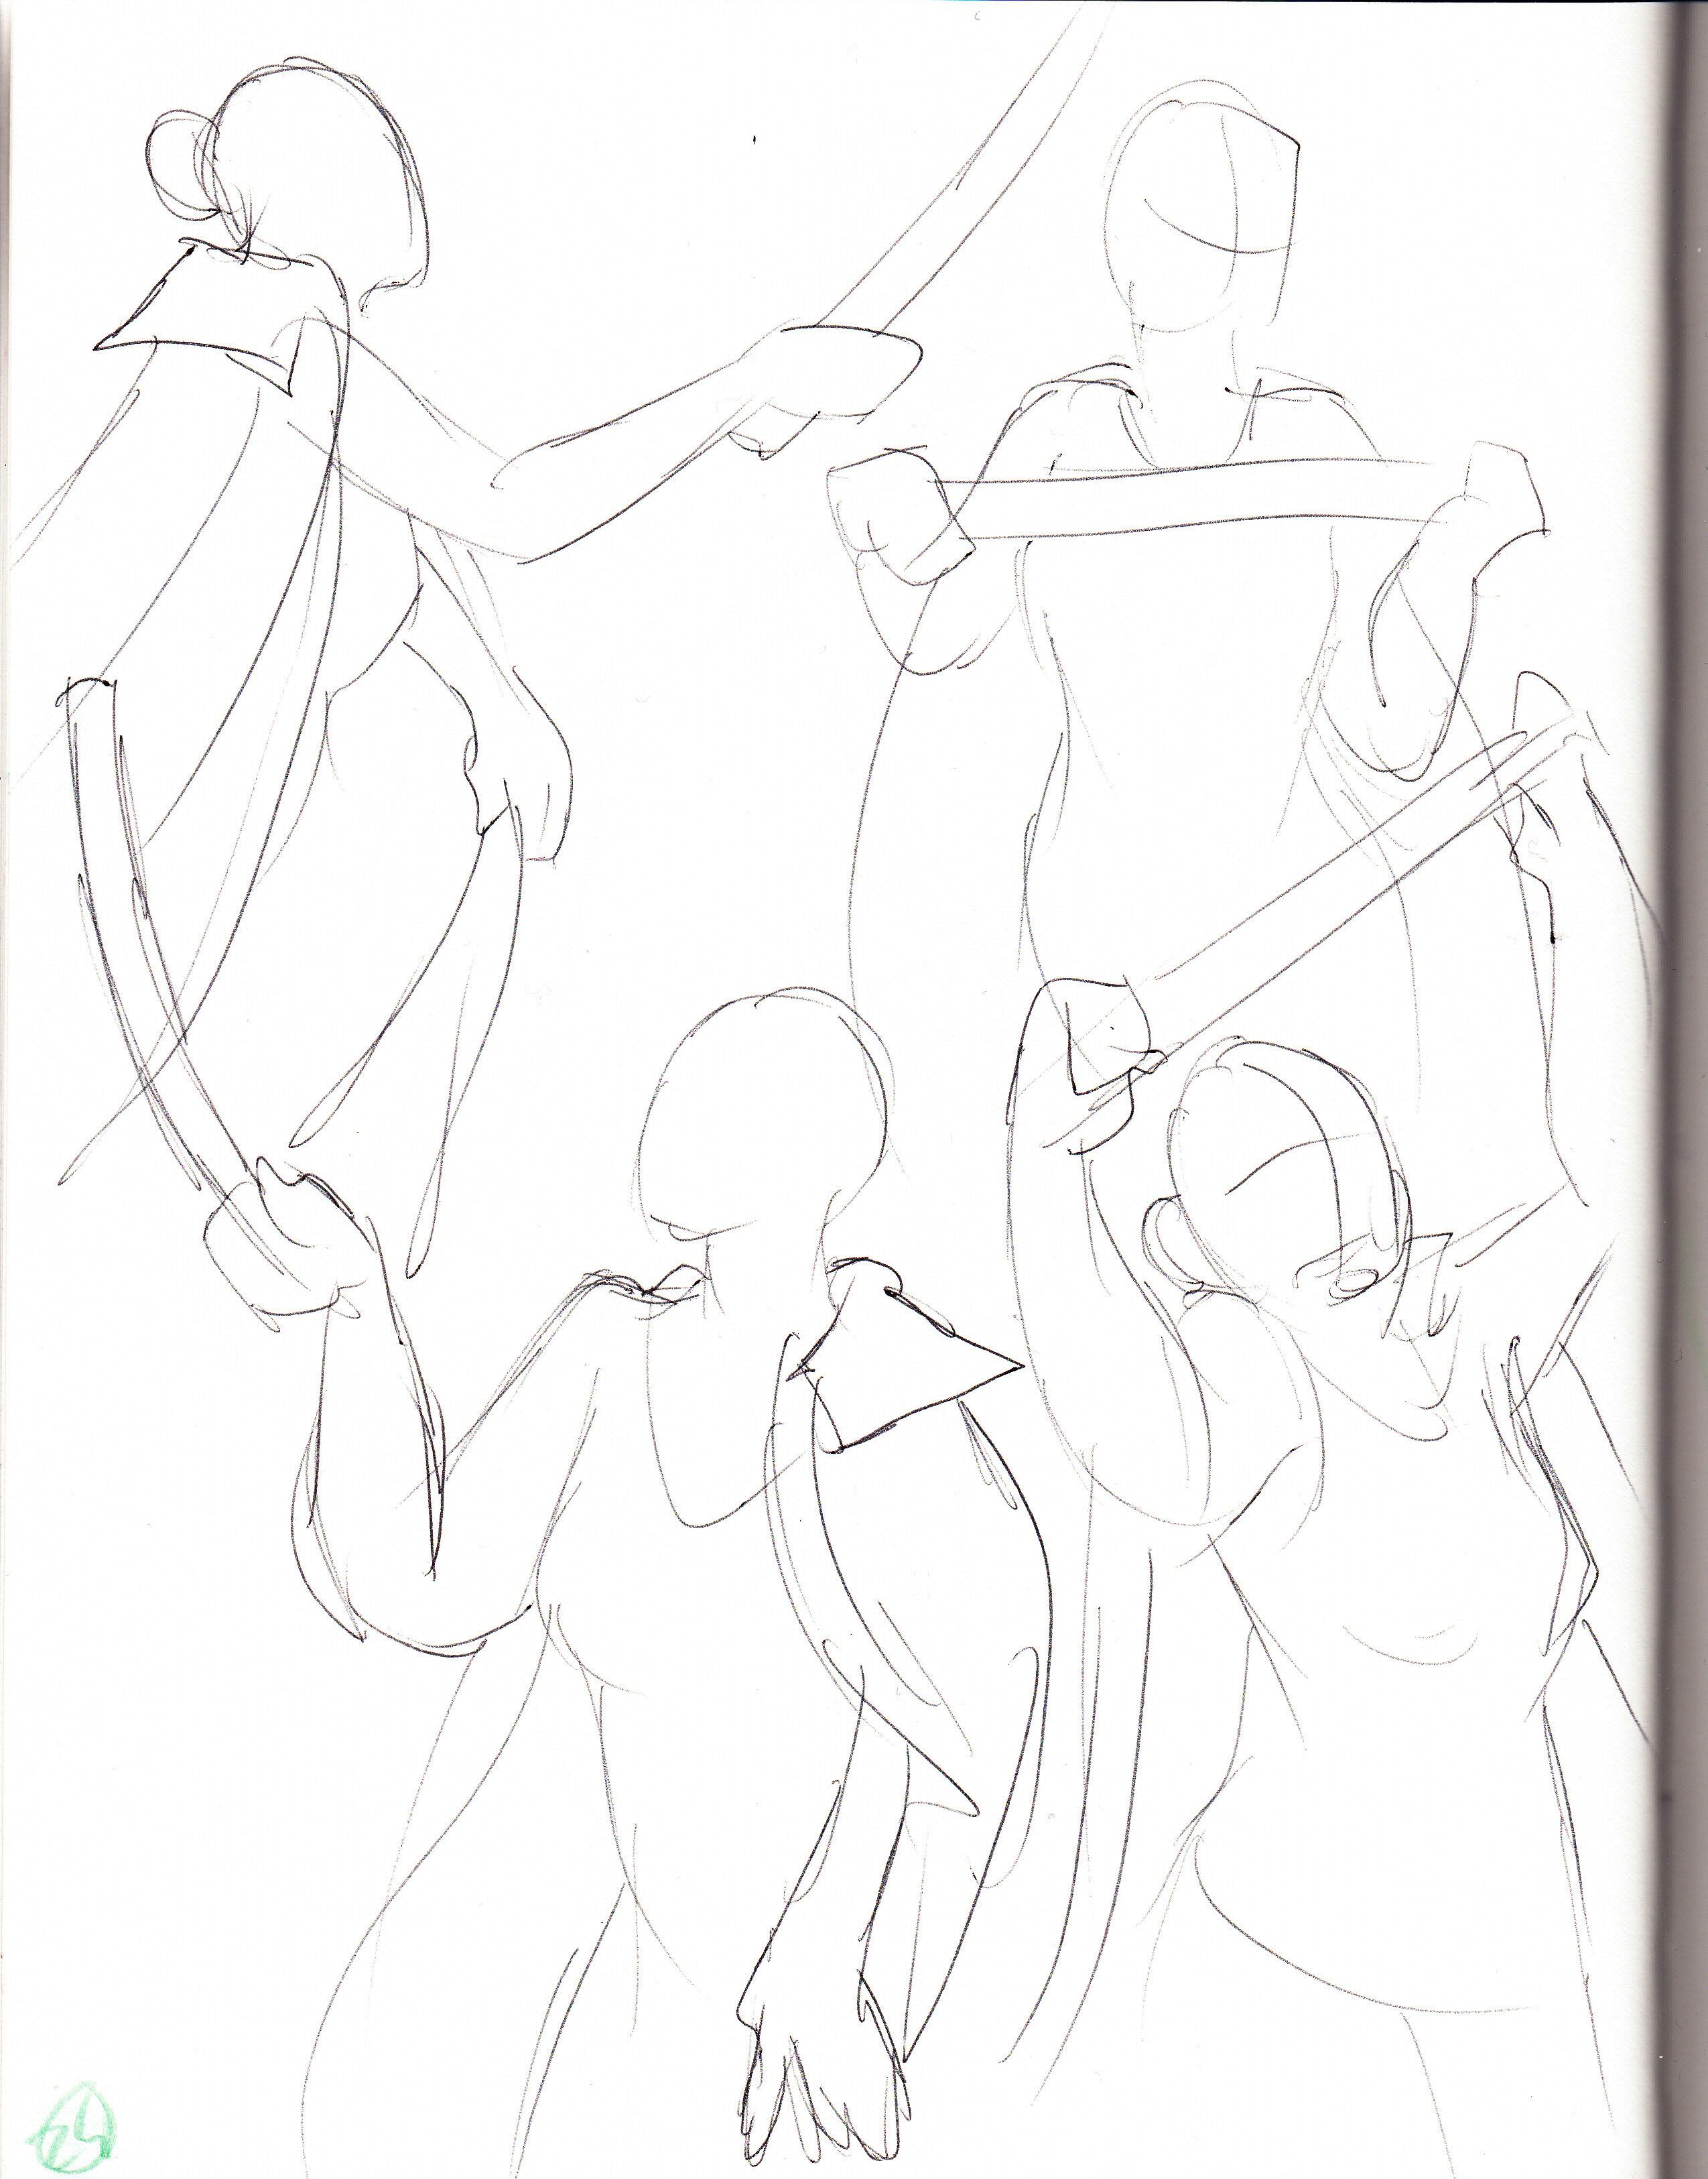 Sketchbook_23